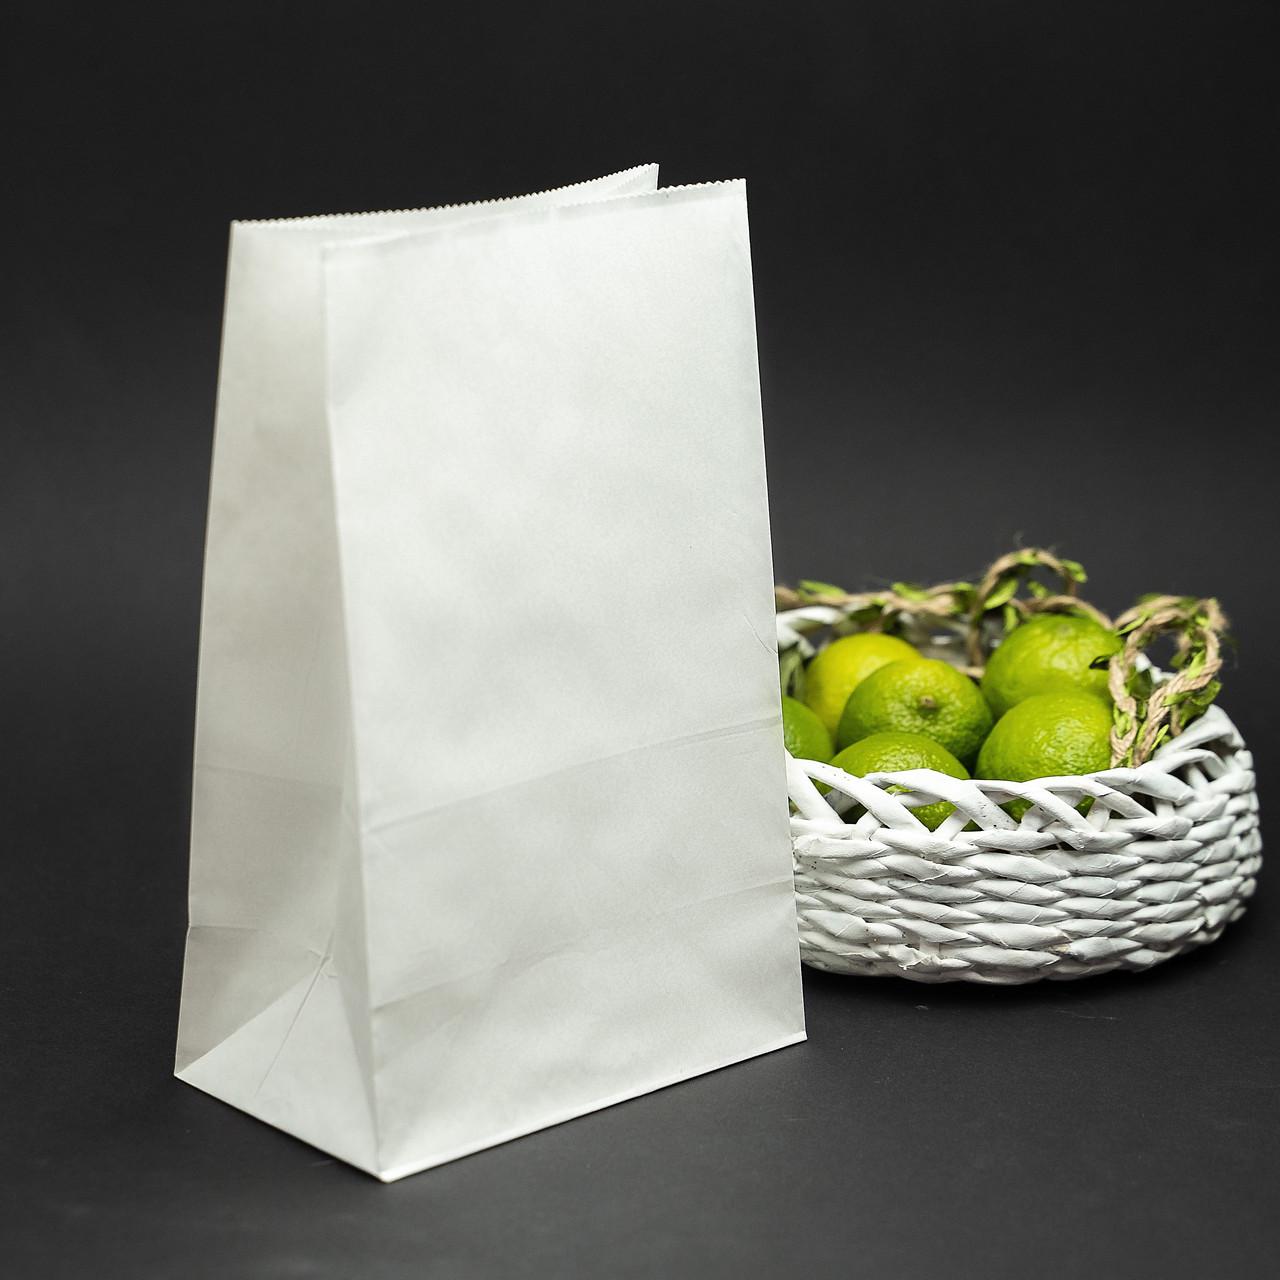 Паперові крафт-пакети з плоским дном 320*150*380 мм пакети паперові великі